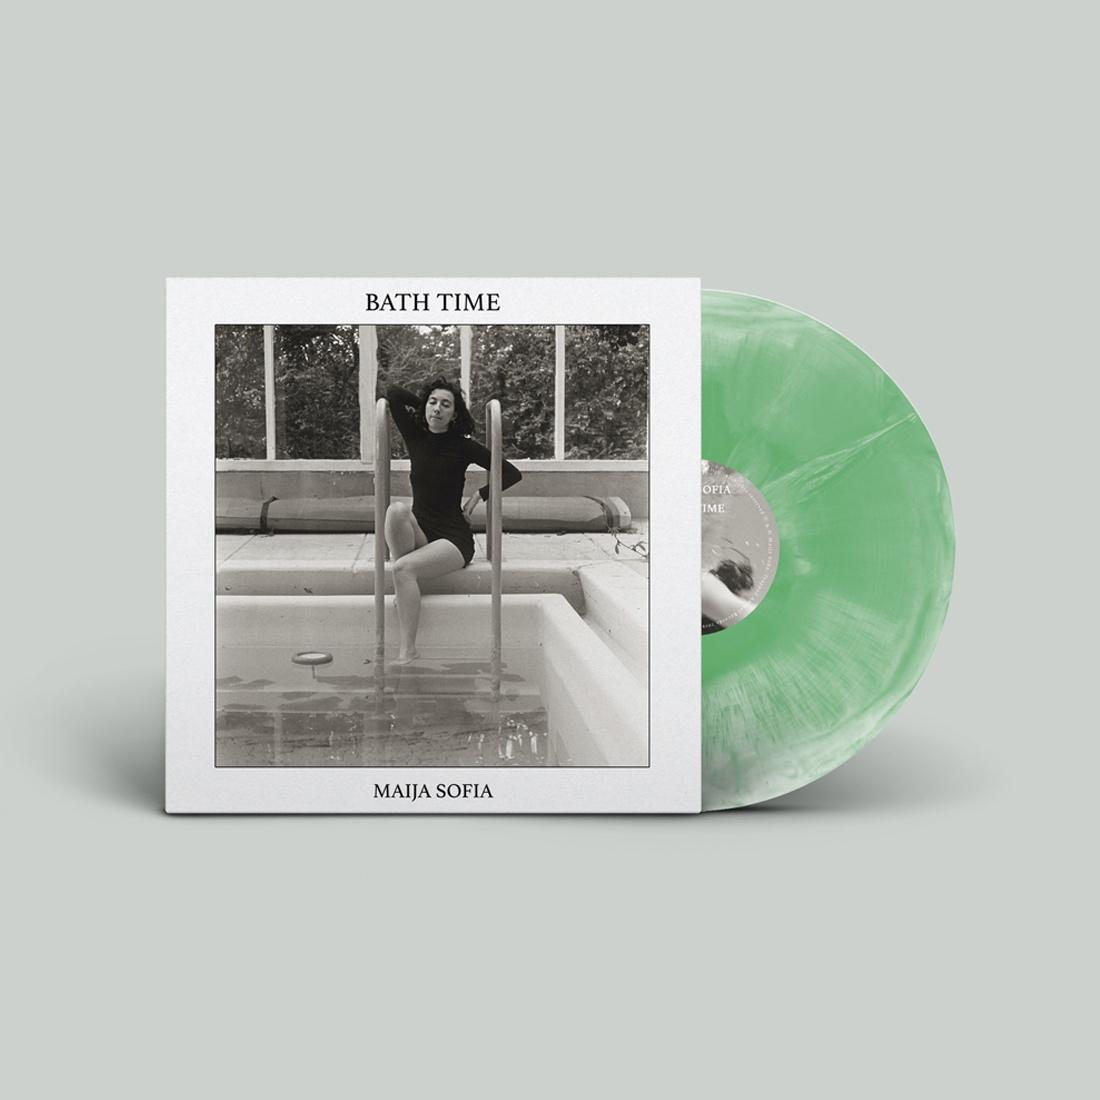 Maija Sofia | Bath Time - Limited Edition Deluxe Marble Vinyl